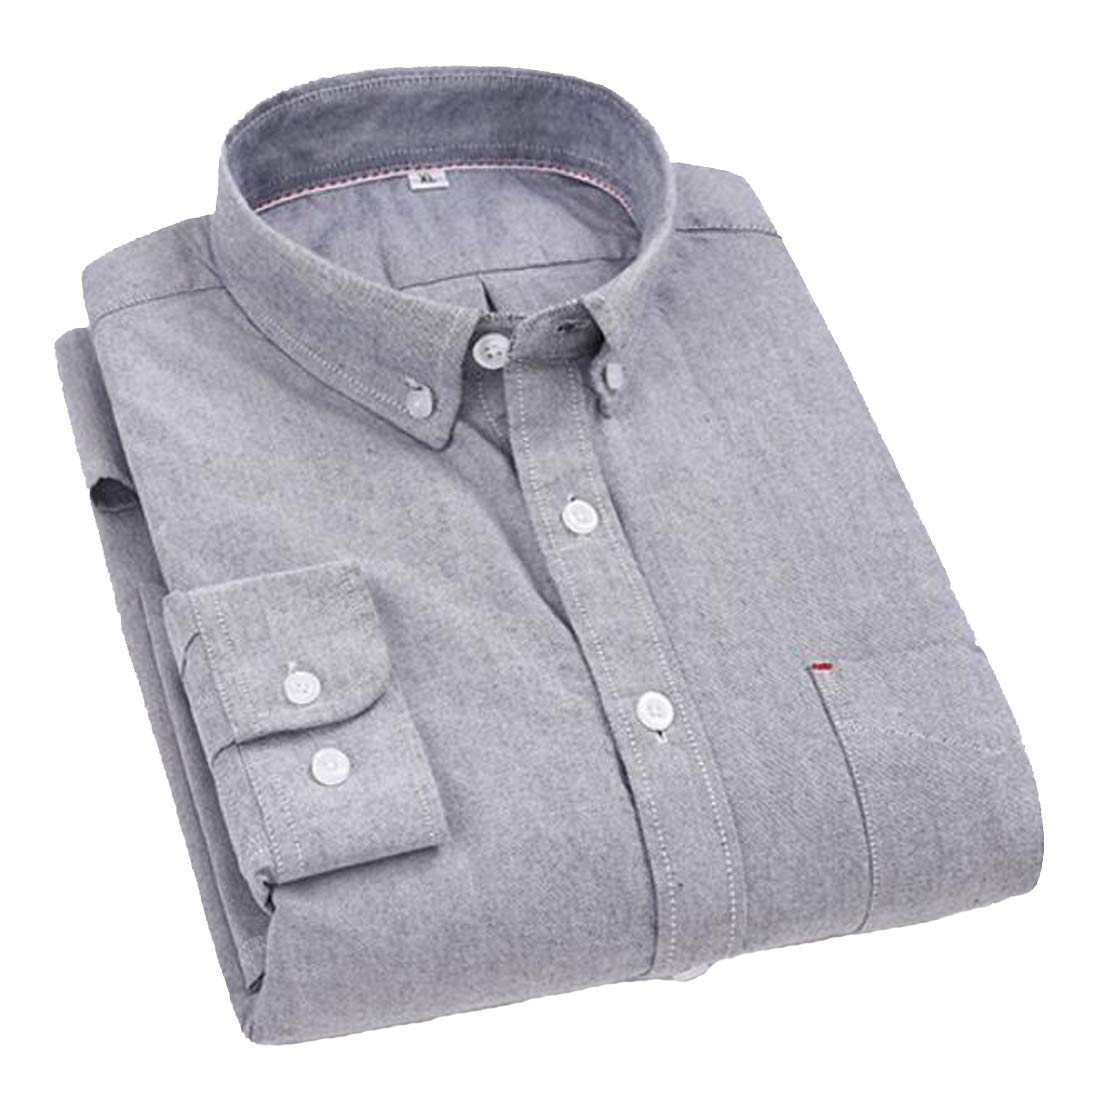 ARTFFEL Men Long Sleeve Formal Slim Fit Cotton Plain Button Down Dress Work Shirt